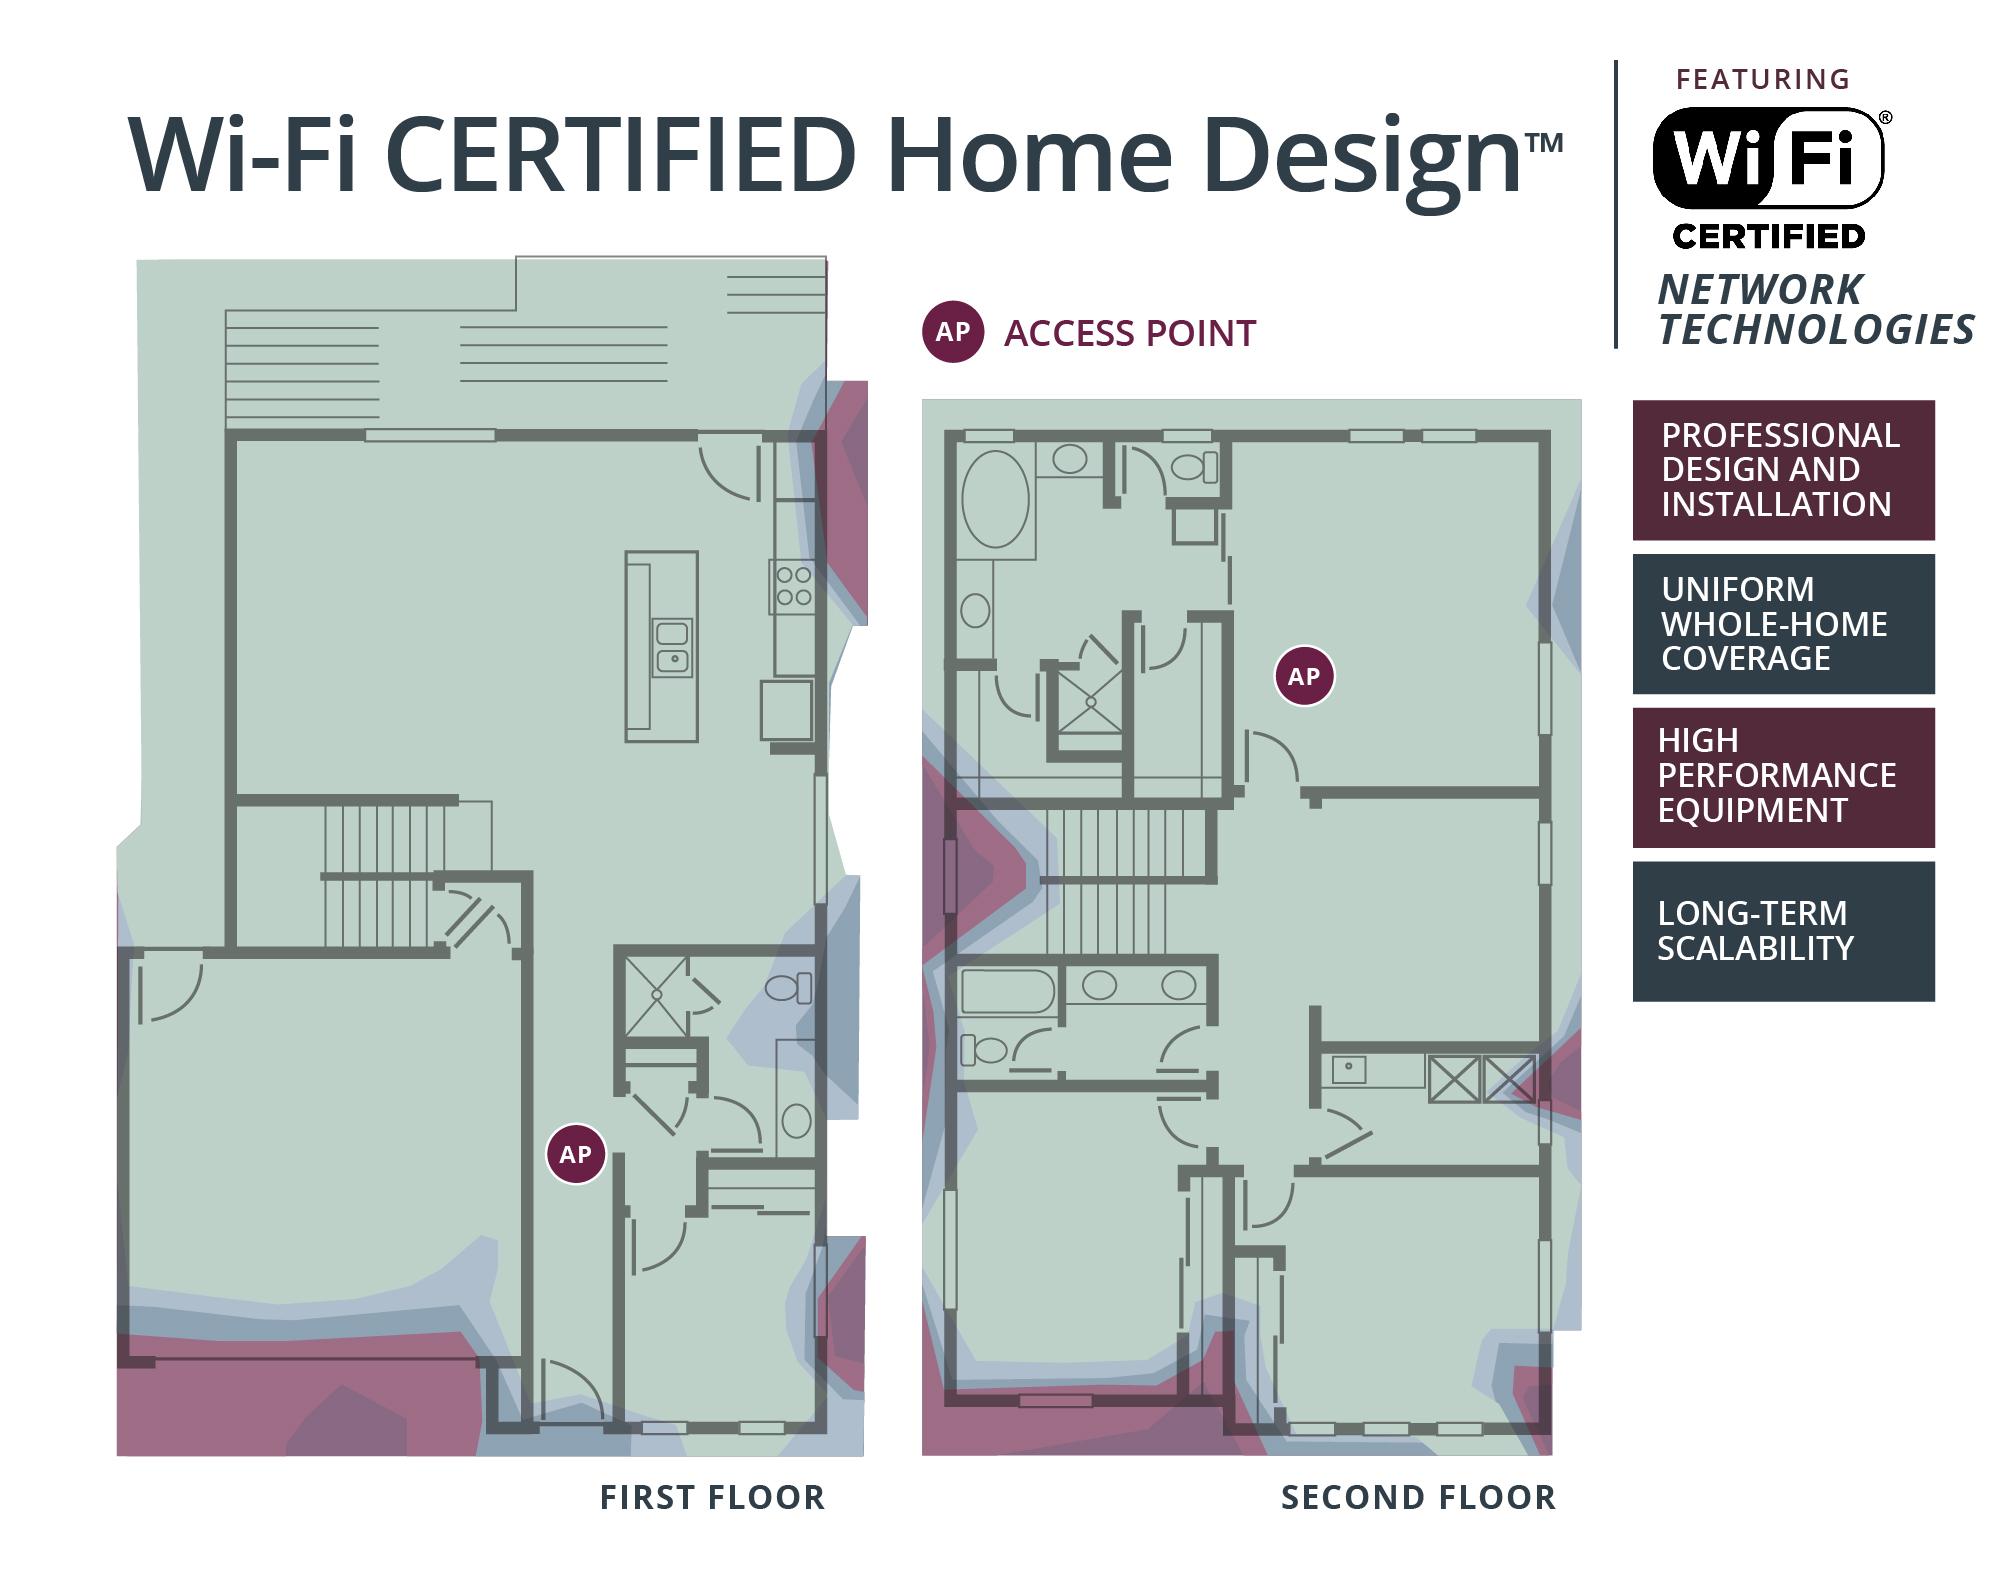 Smart home, un wifi senz apunti ciechi, infografica rappresentativa